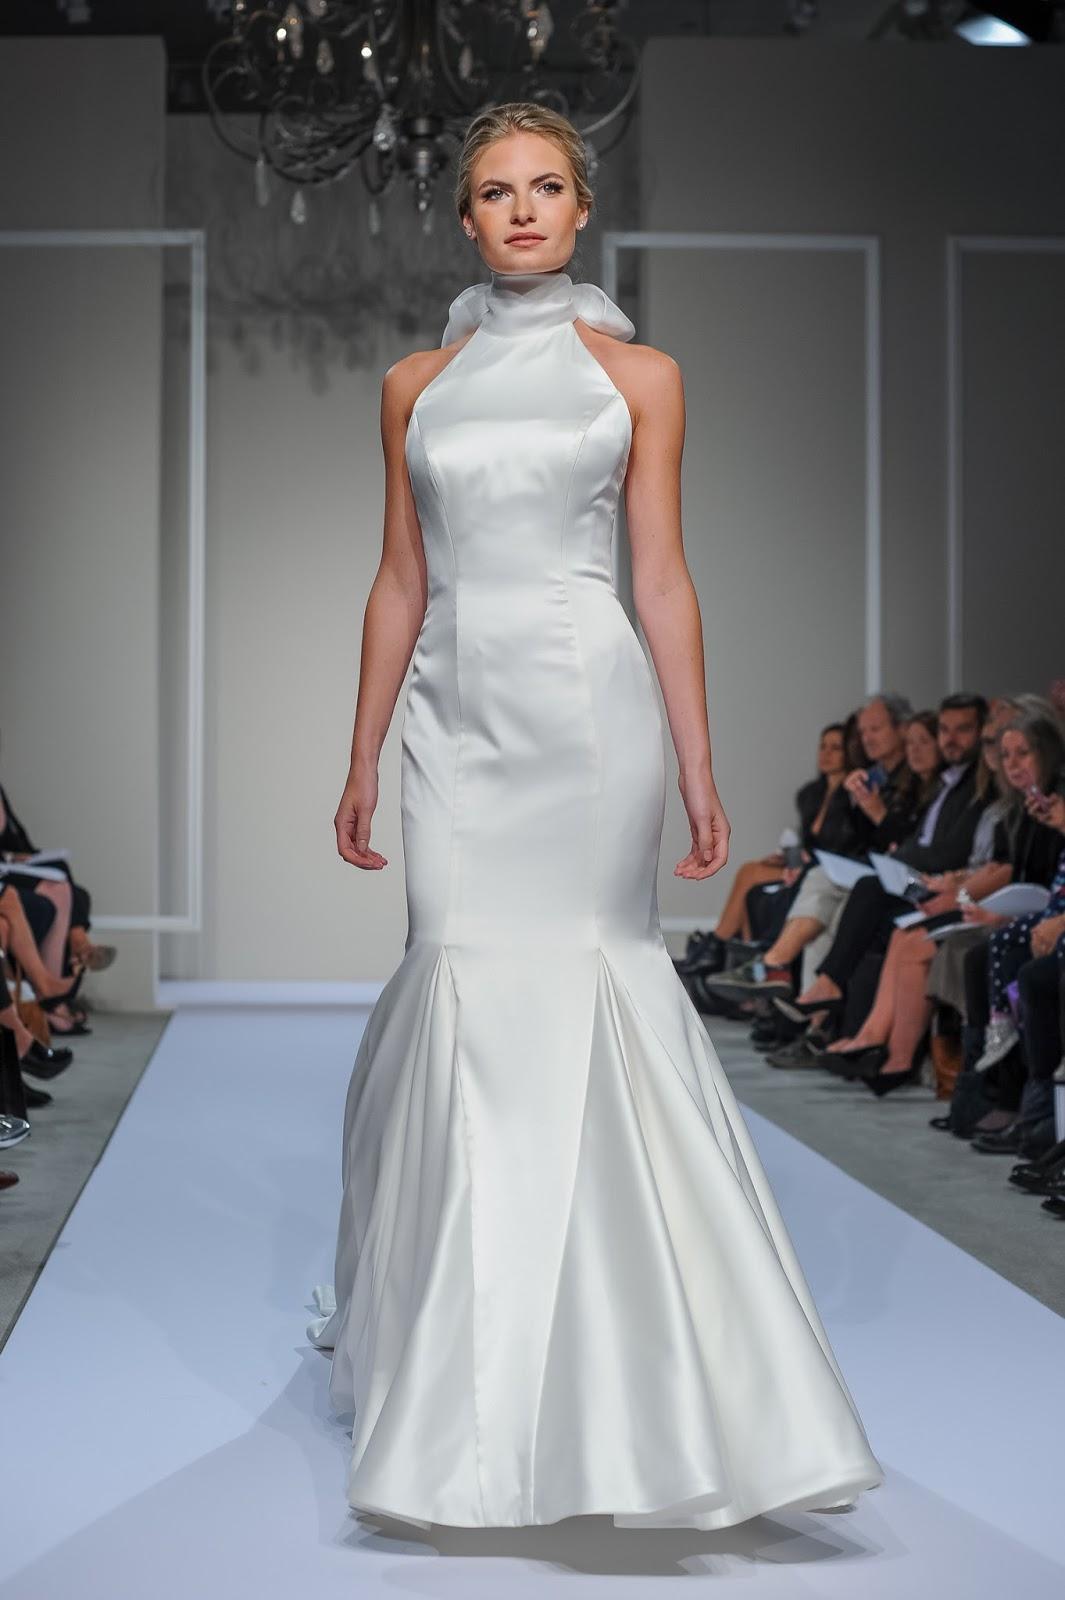 Panina Wedding Dress Designer 19 New Where Dennis Basso is